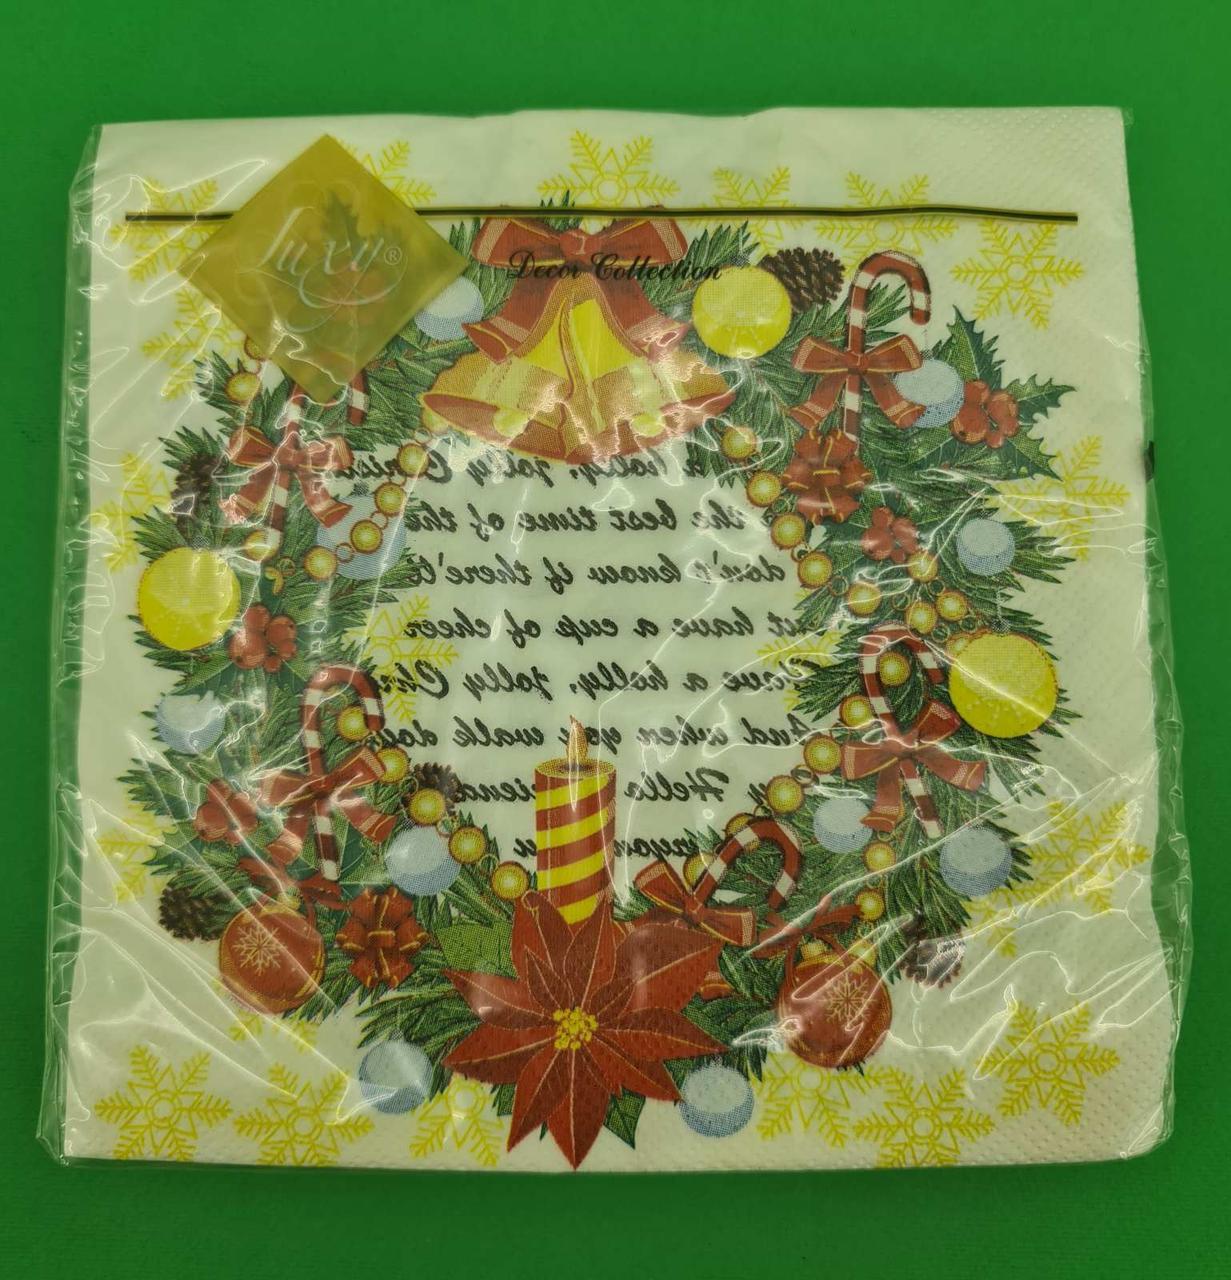 Салфетка для декупажа ЗЗхЗЗ 20шт Рождественский оберег (1 пач)